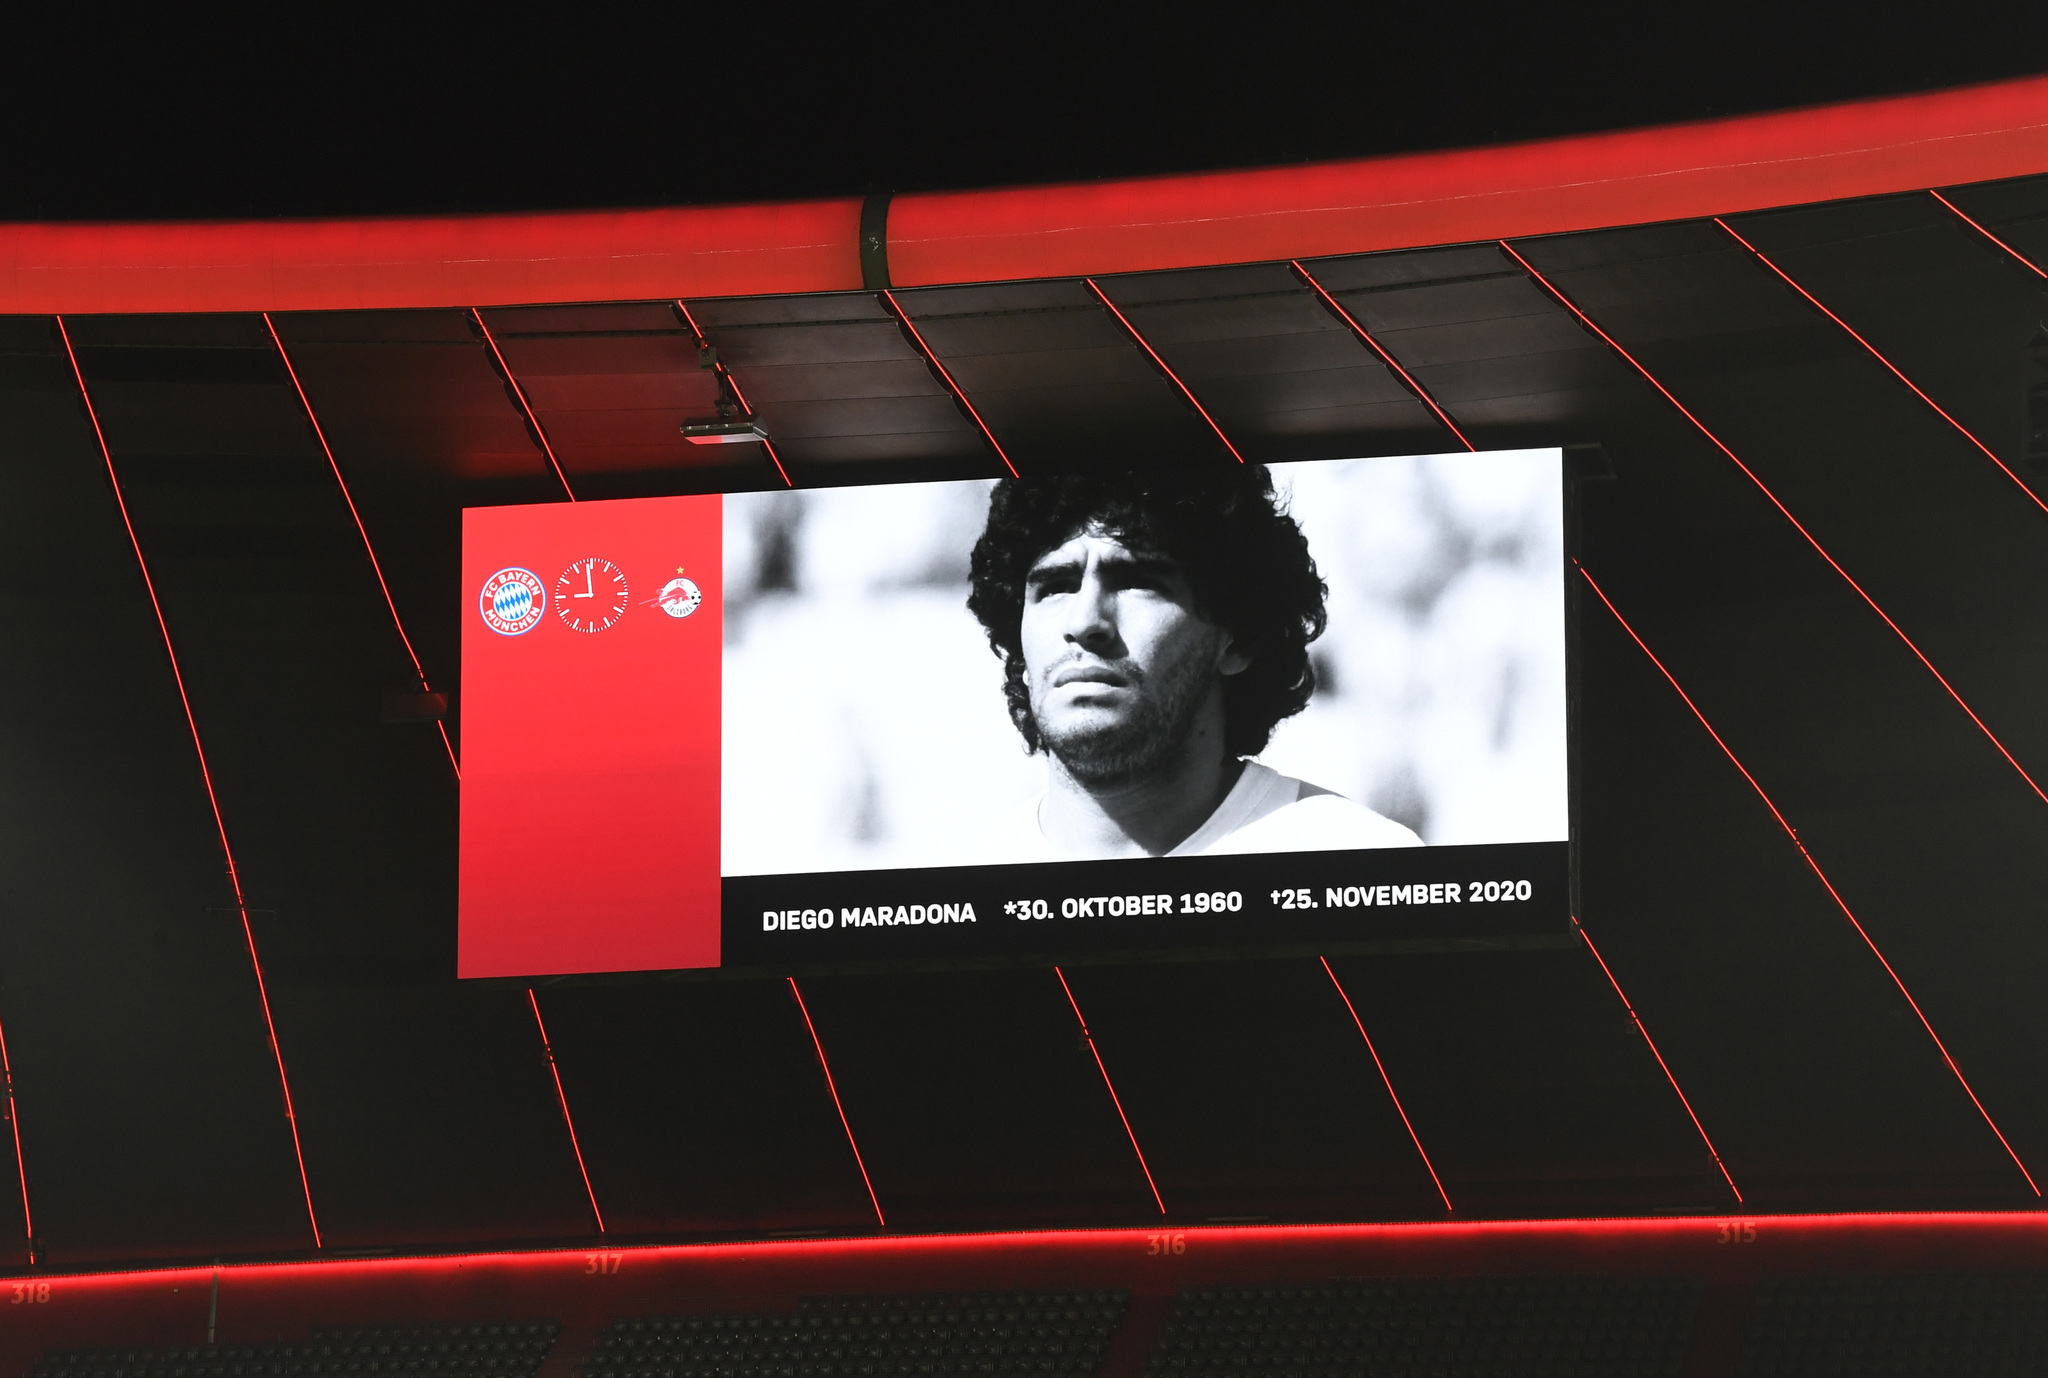 La Champions League se rinde a Diego Armando Maradona